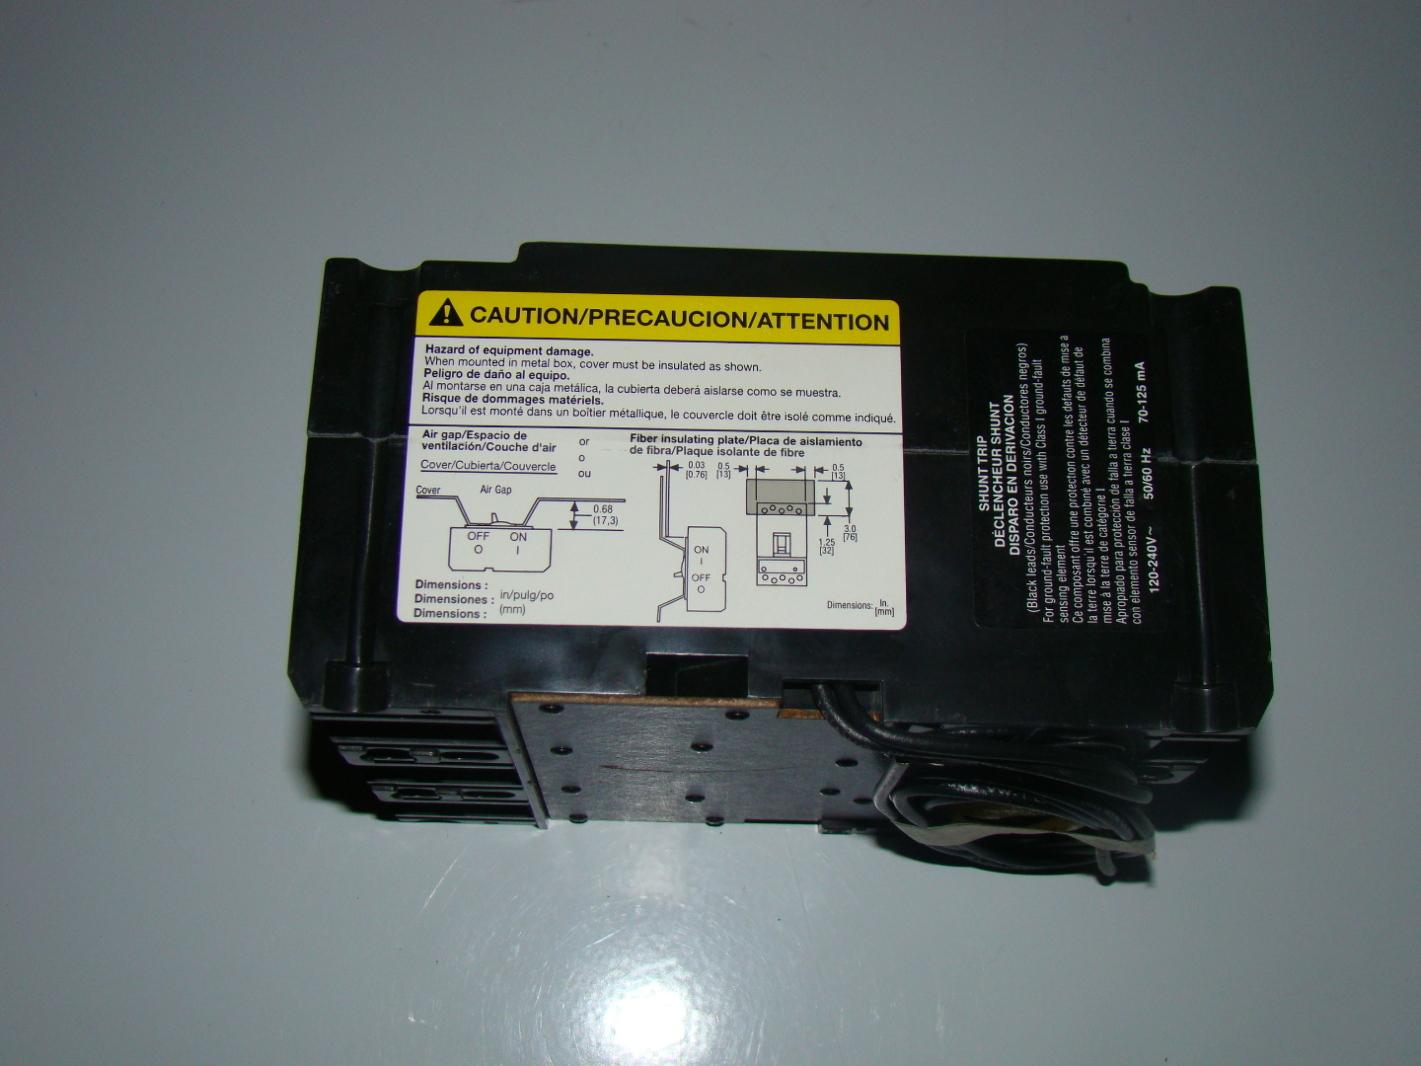 ge shunt trip circuit breaker wiring diagram chevrolet colorado fuse thqb 41